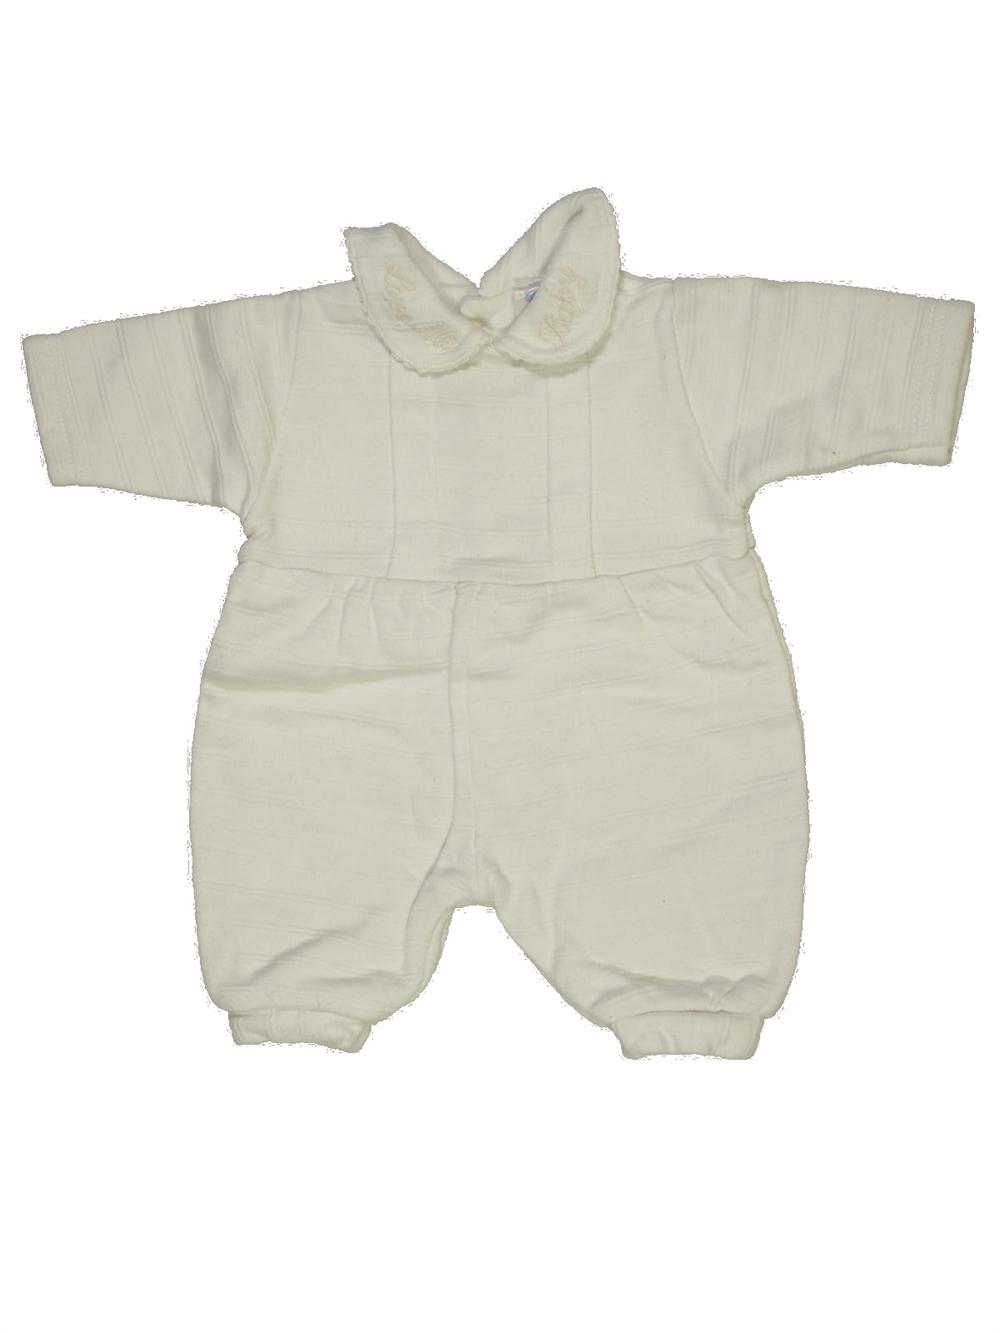 Pyjama 1 piece blanc TARTINE ET CHOCOLAT du naissance pour Fille ou Garcon  - 584828 b22804ff7dc